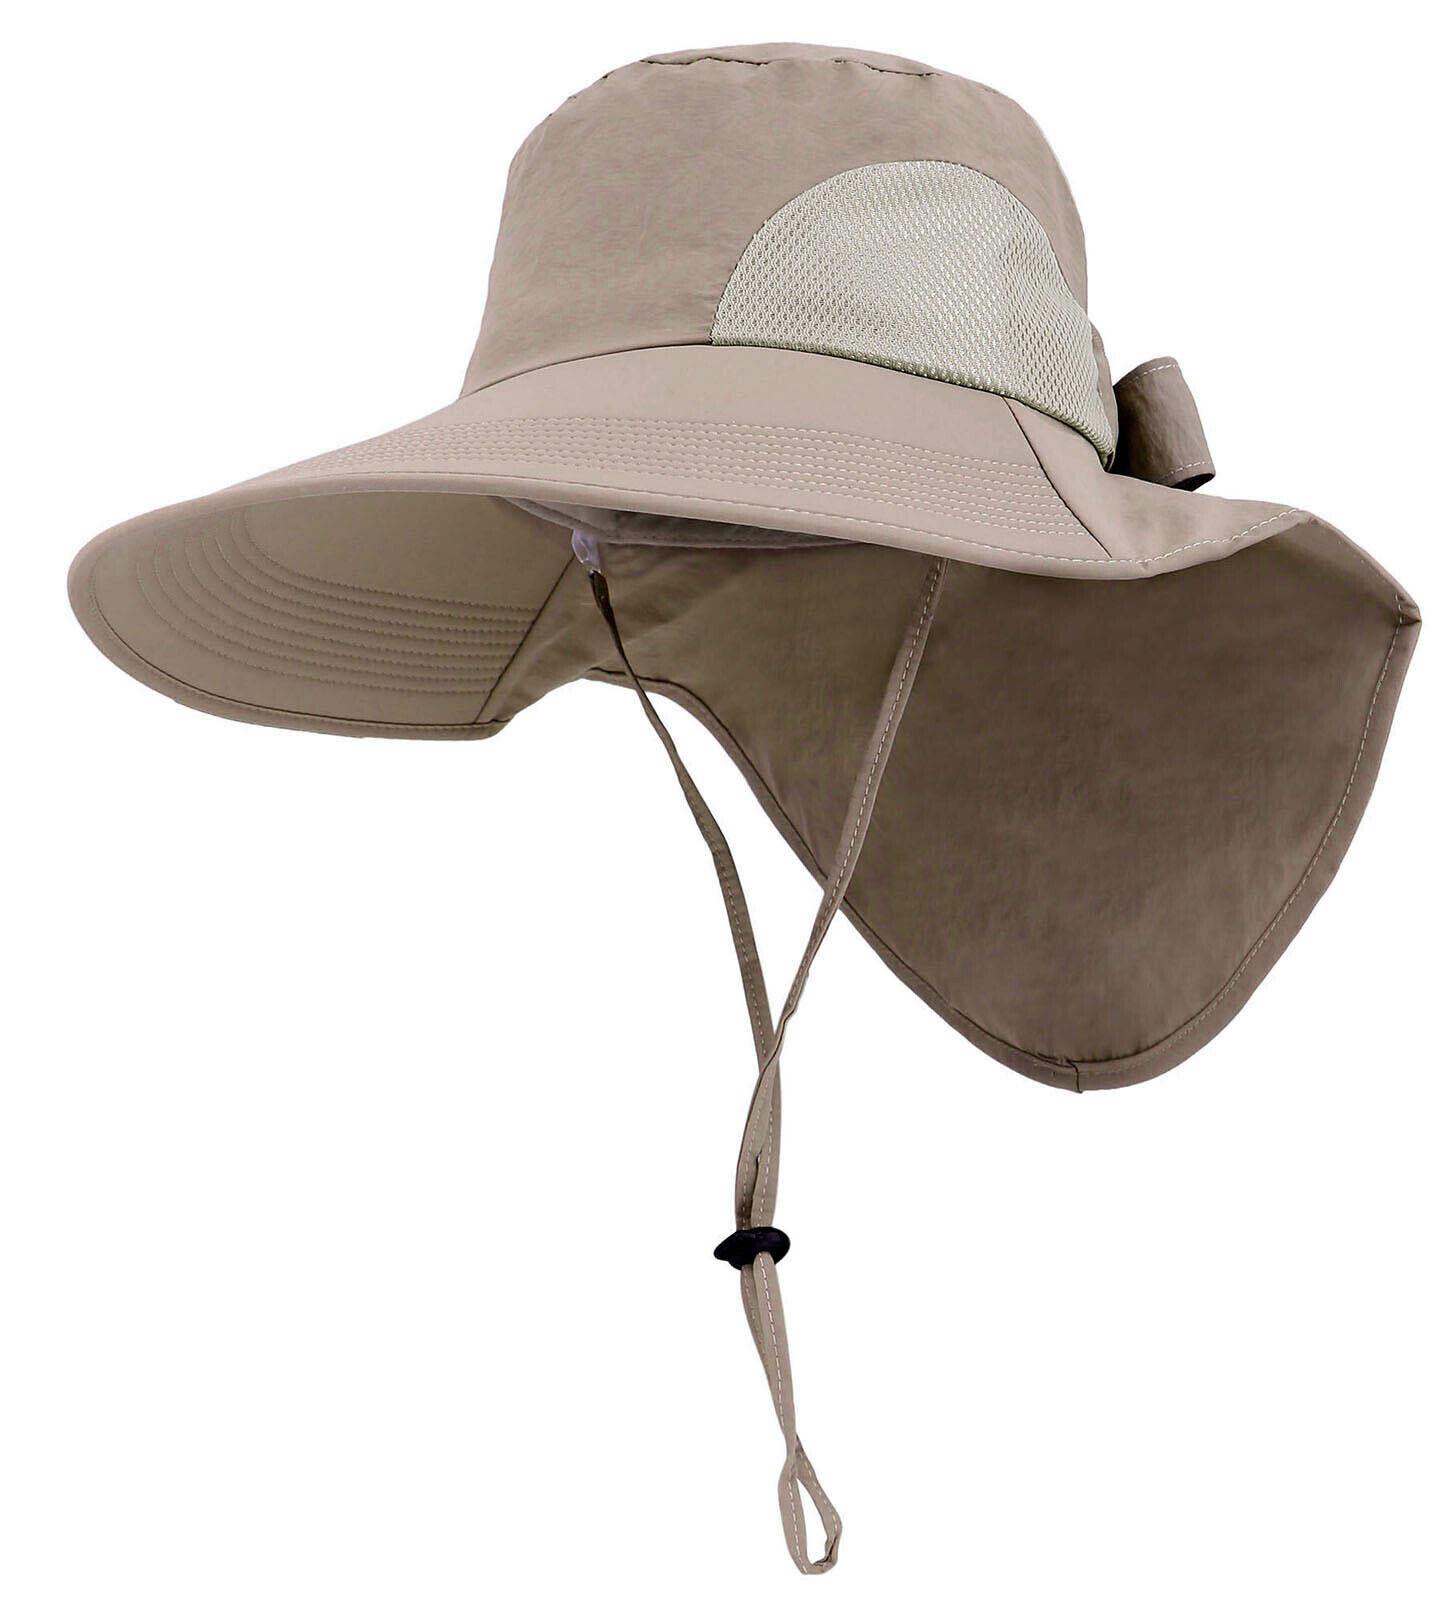 Womens Summer Flap Cover Cap Wide Brim UPF 50+ Sun Shade Hat